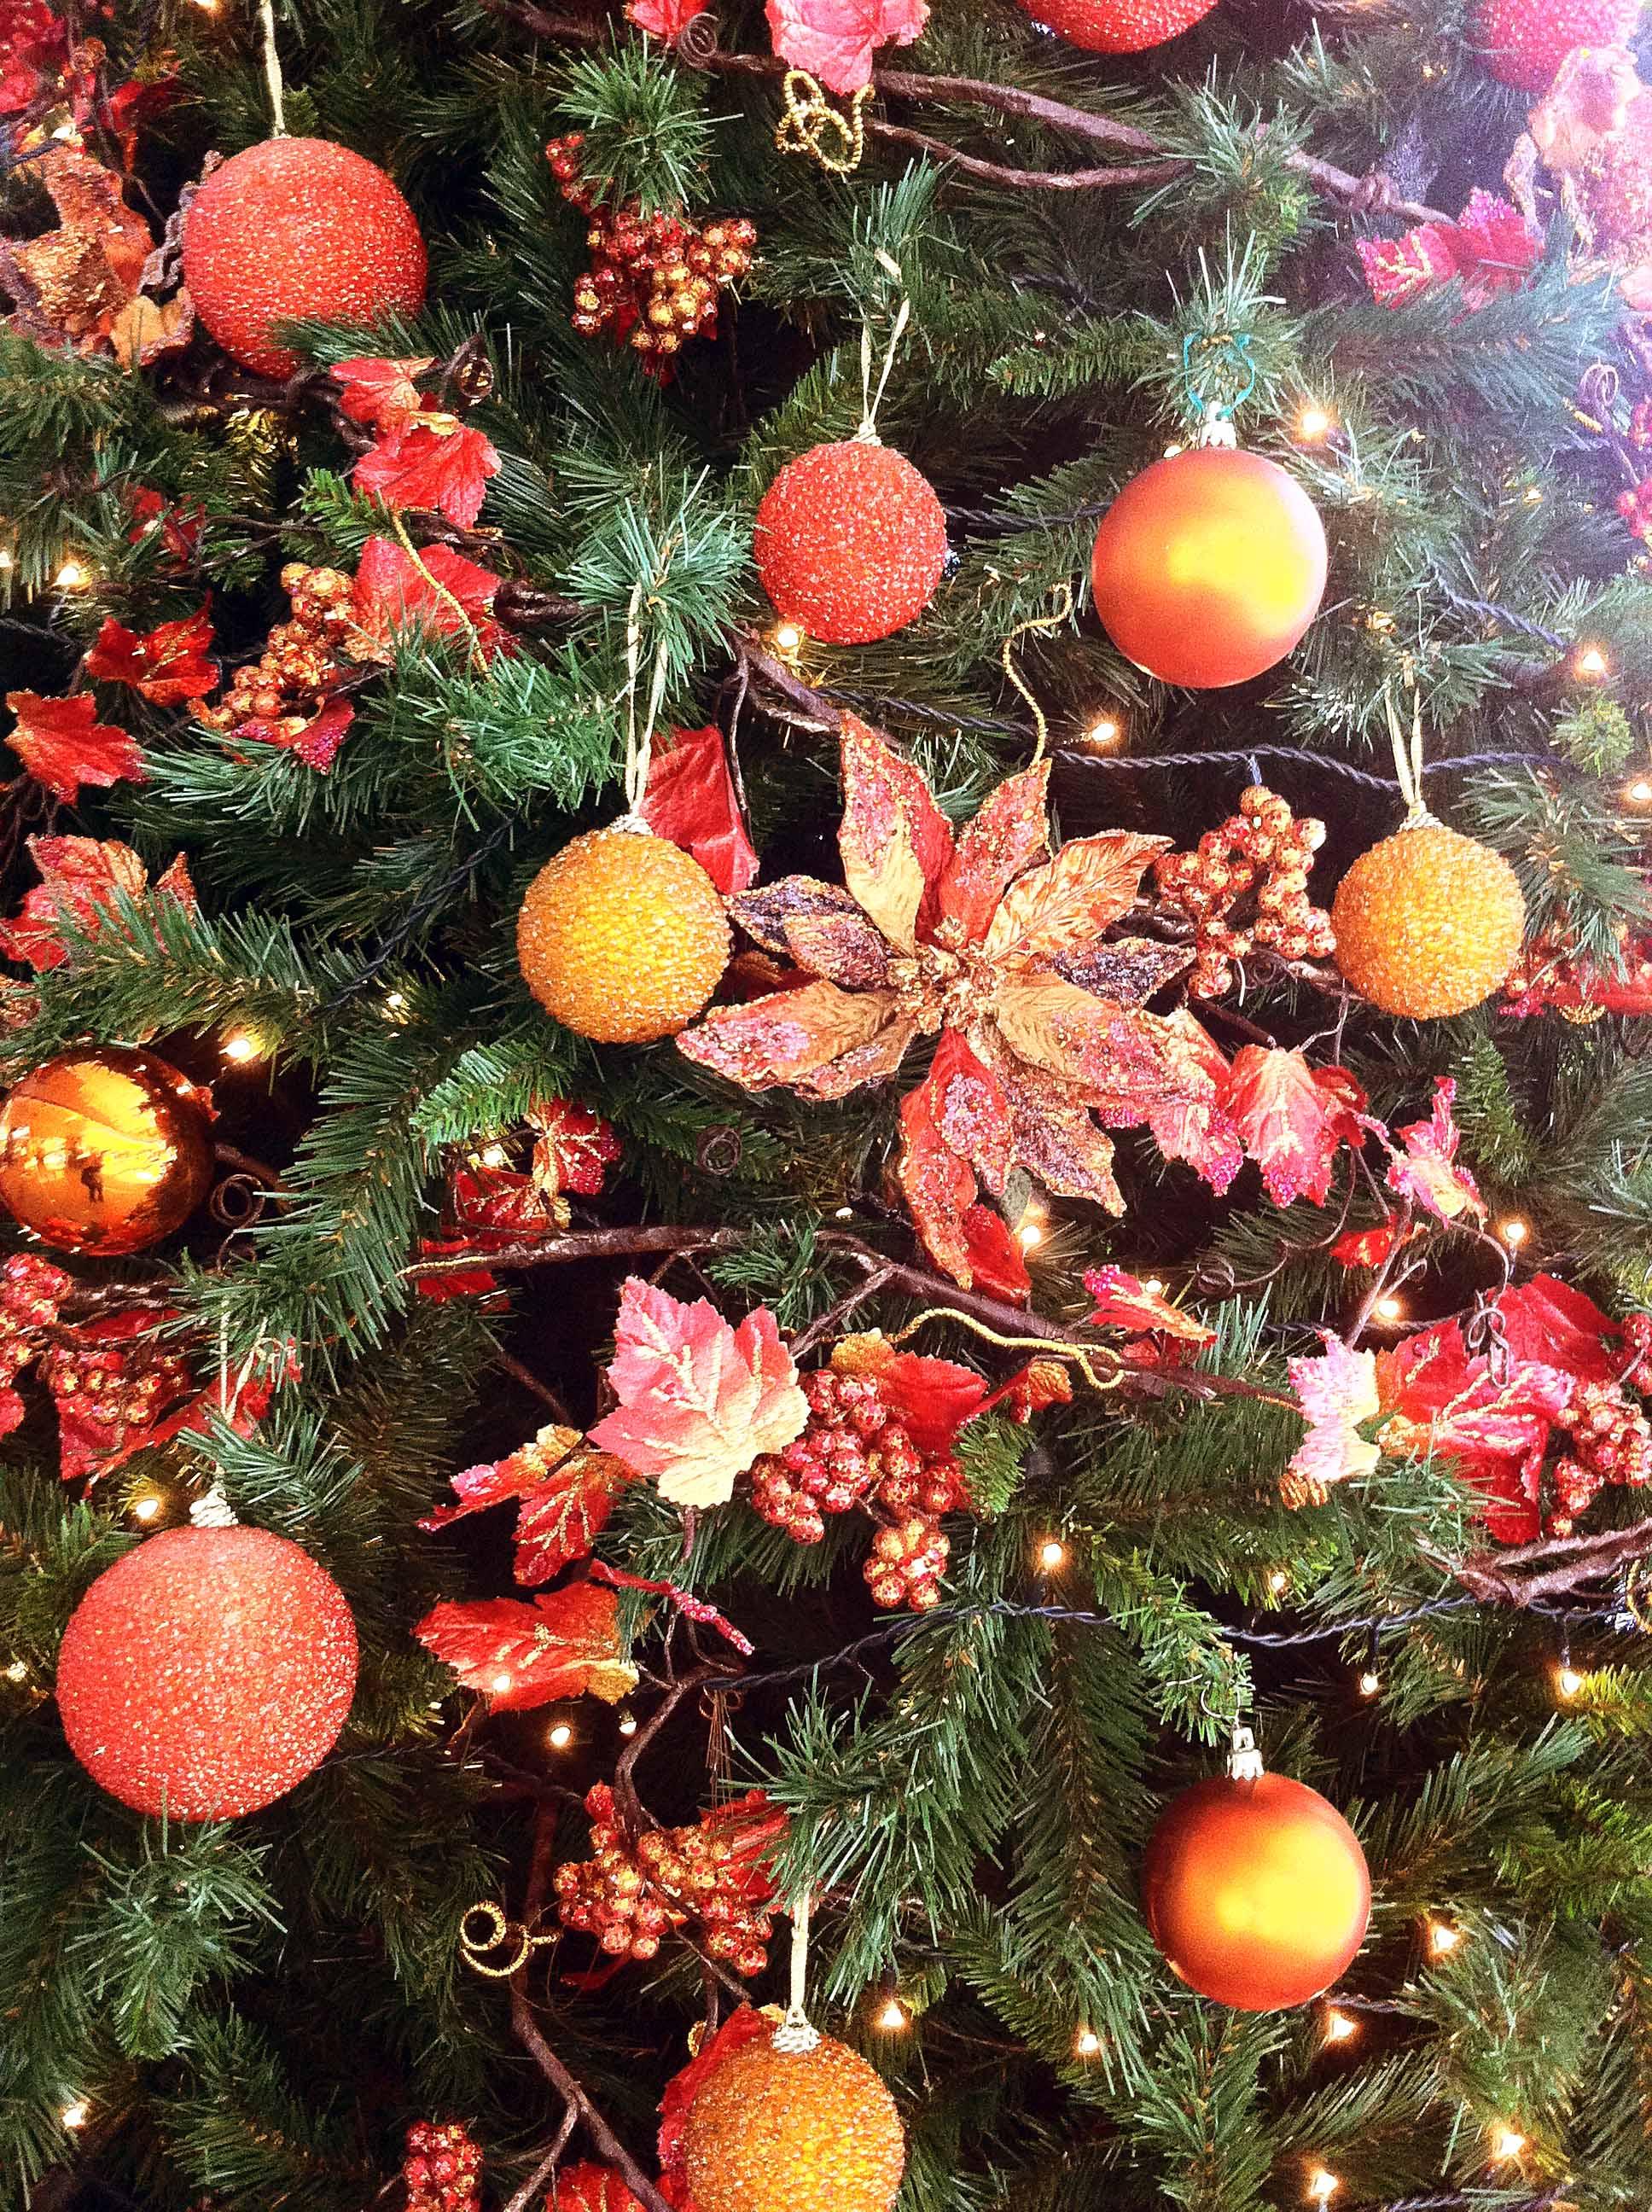 Árboles Navidad color naranja | B&M - Árboles de Navidad